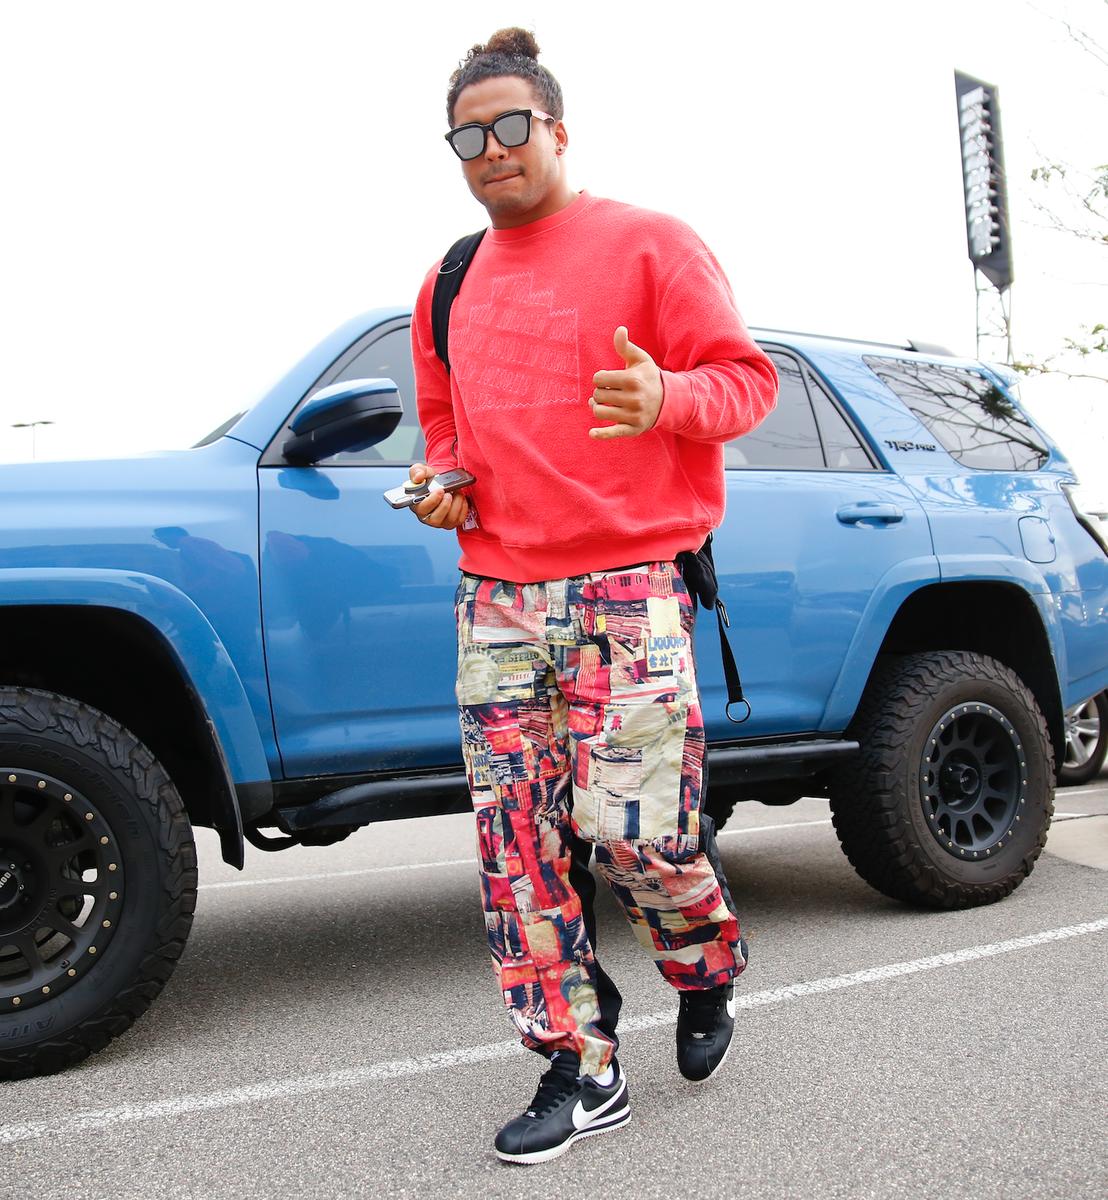 📸 Smart, leger oder Party-mäßig?  Welcher Style steht Eric Kendricks am besten? #EricKendricksWeek https://t.co/bQ7gGLbLrC